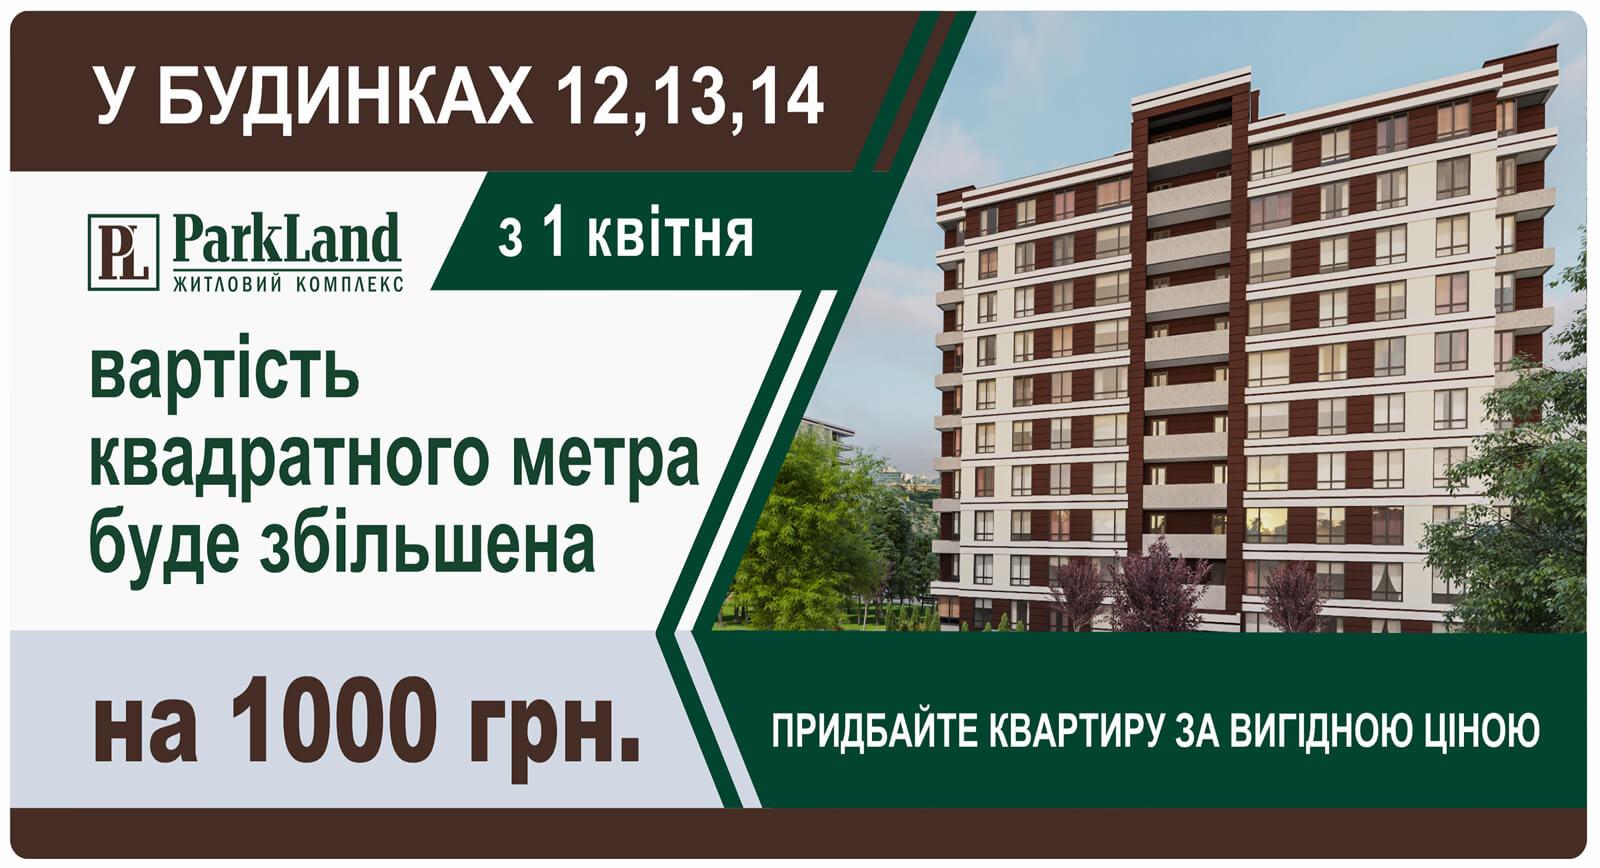 news-1-12-14dom-0318-ukr